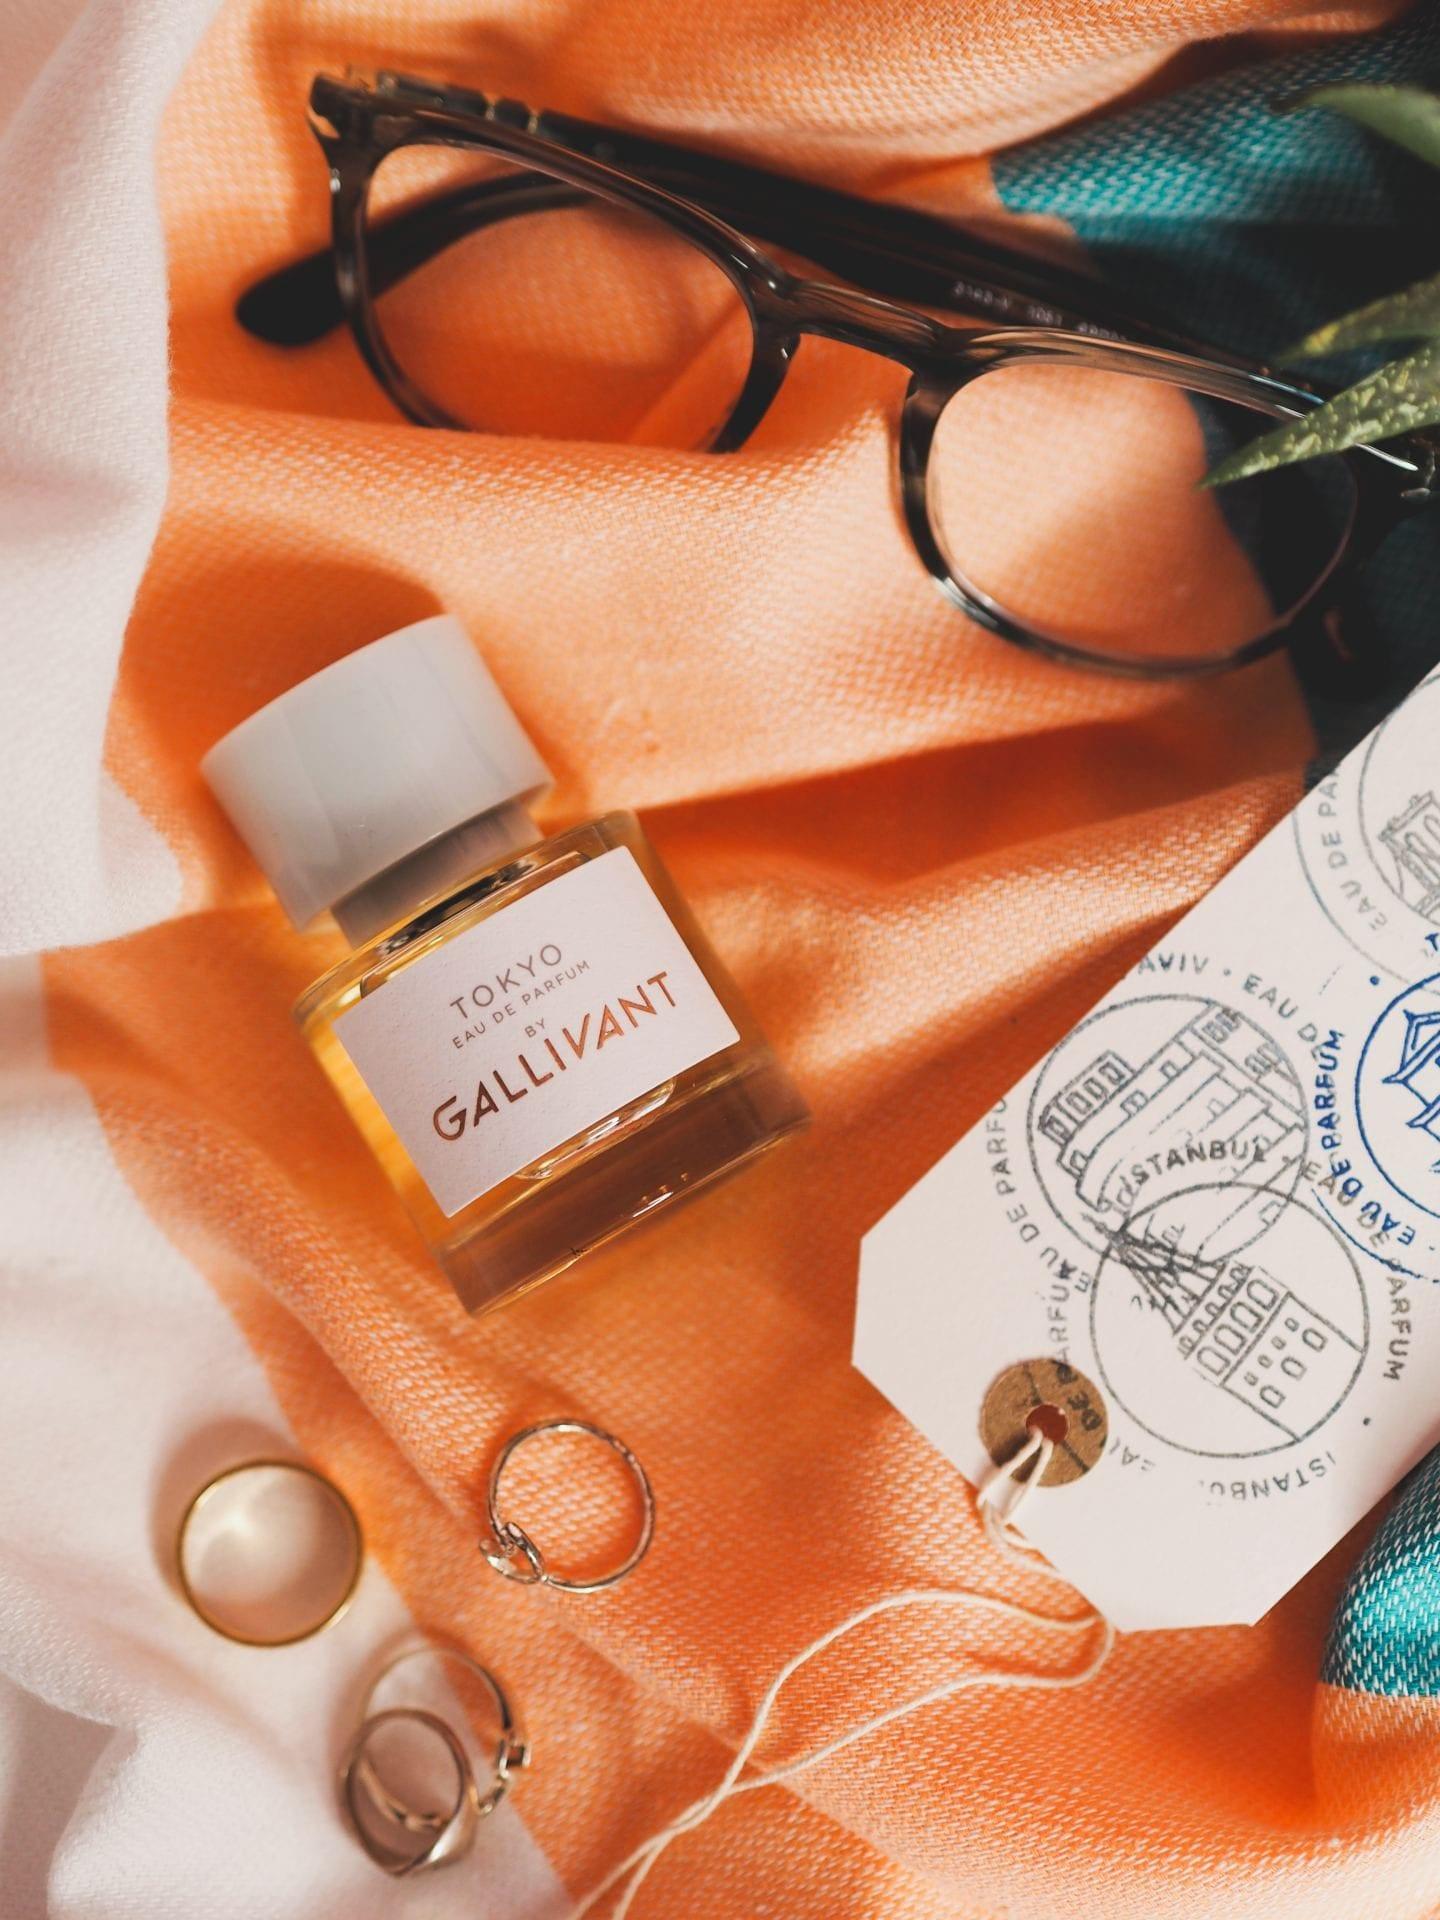 Gallivant 'Tokyo' perfume fragrance review 2019